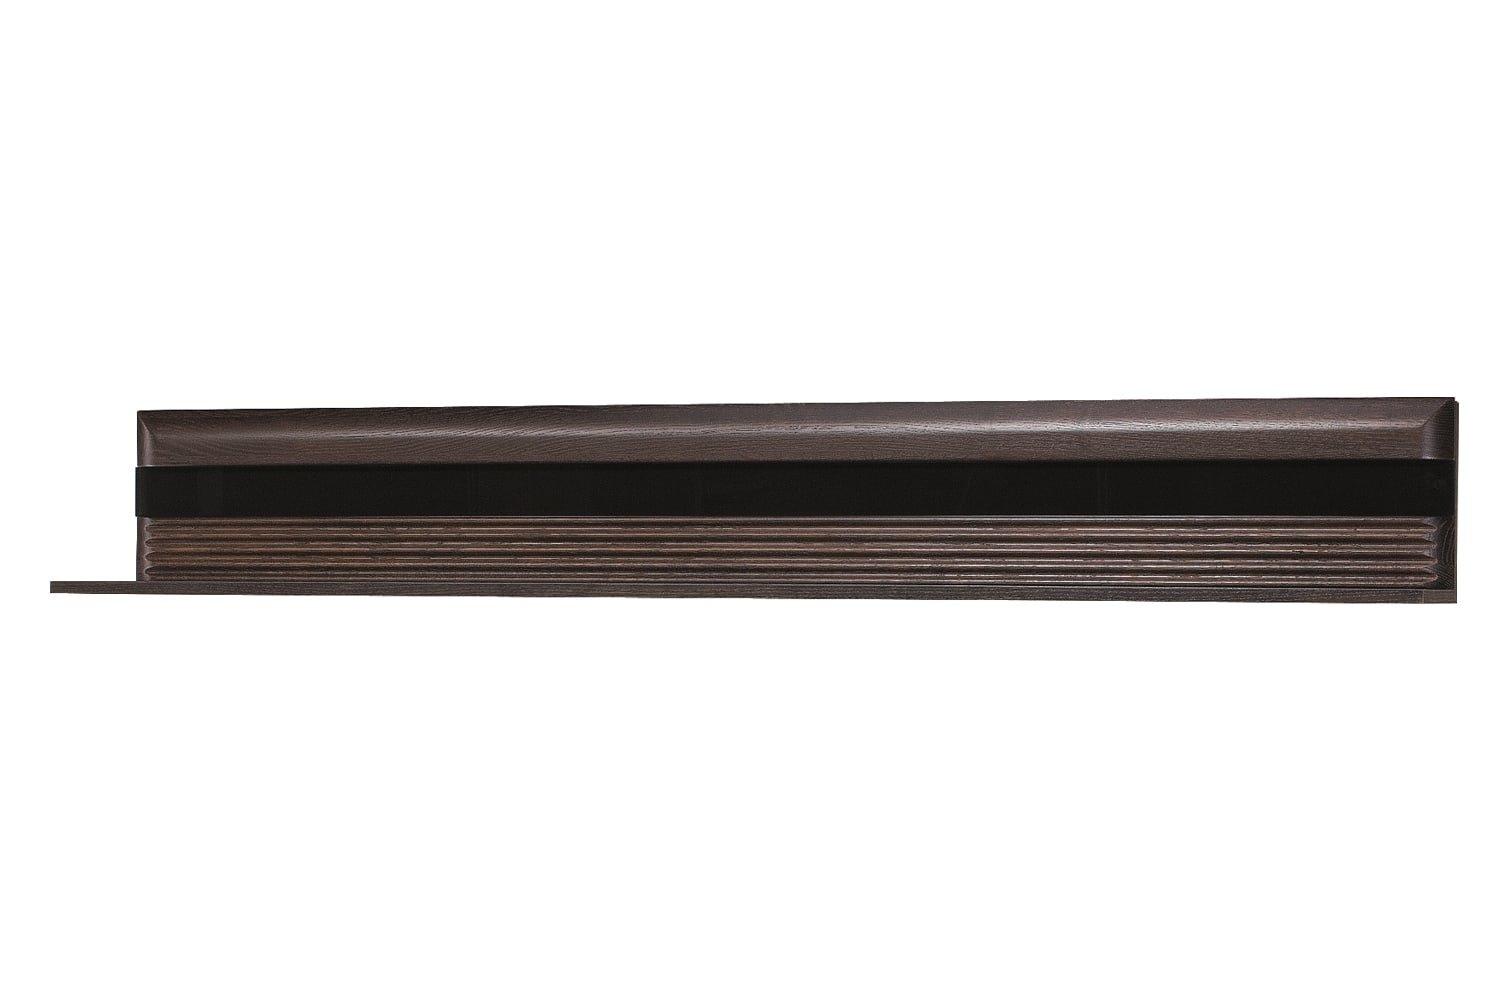 Etajera Porti 35 Chocolate Oak L160xl25xh23 cm